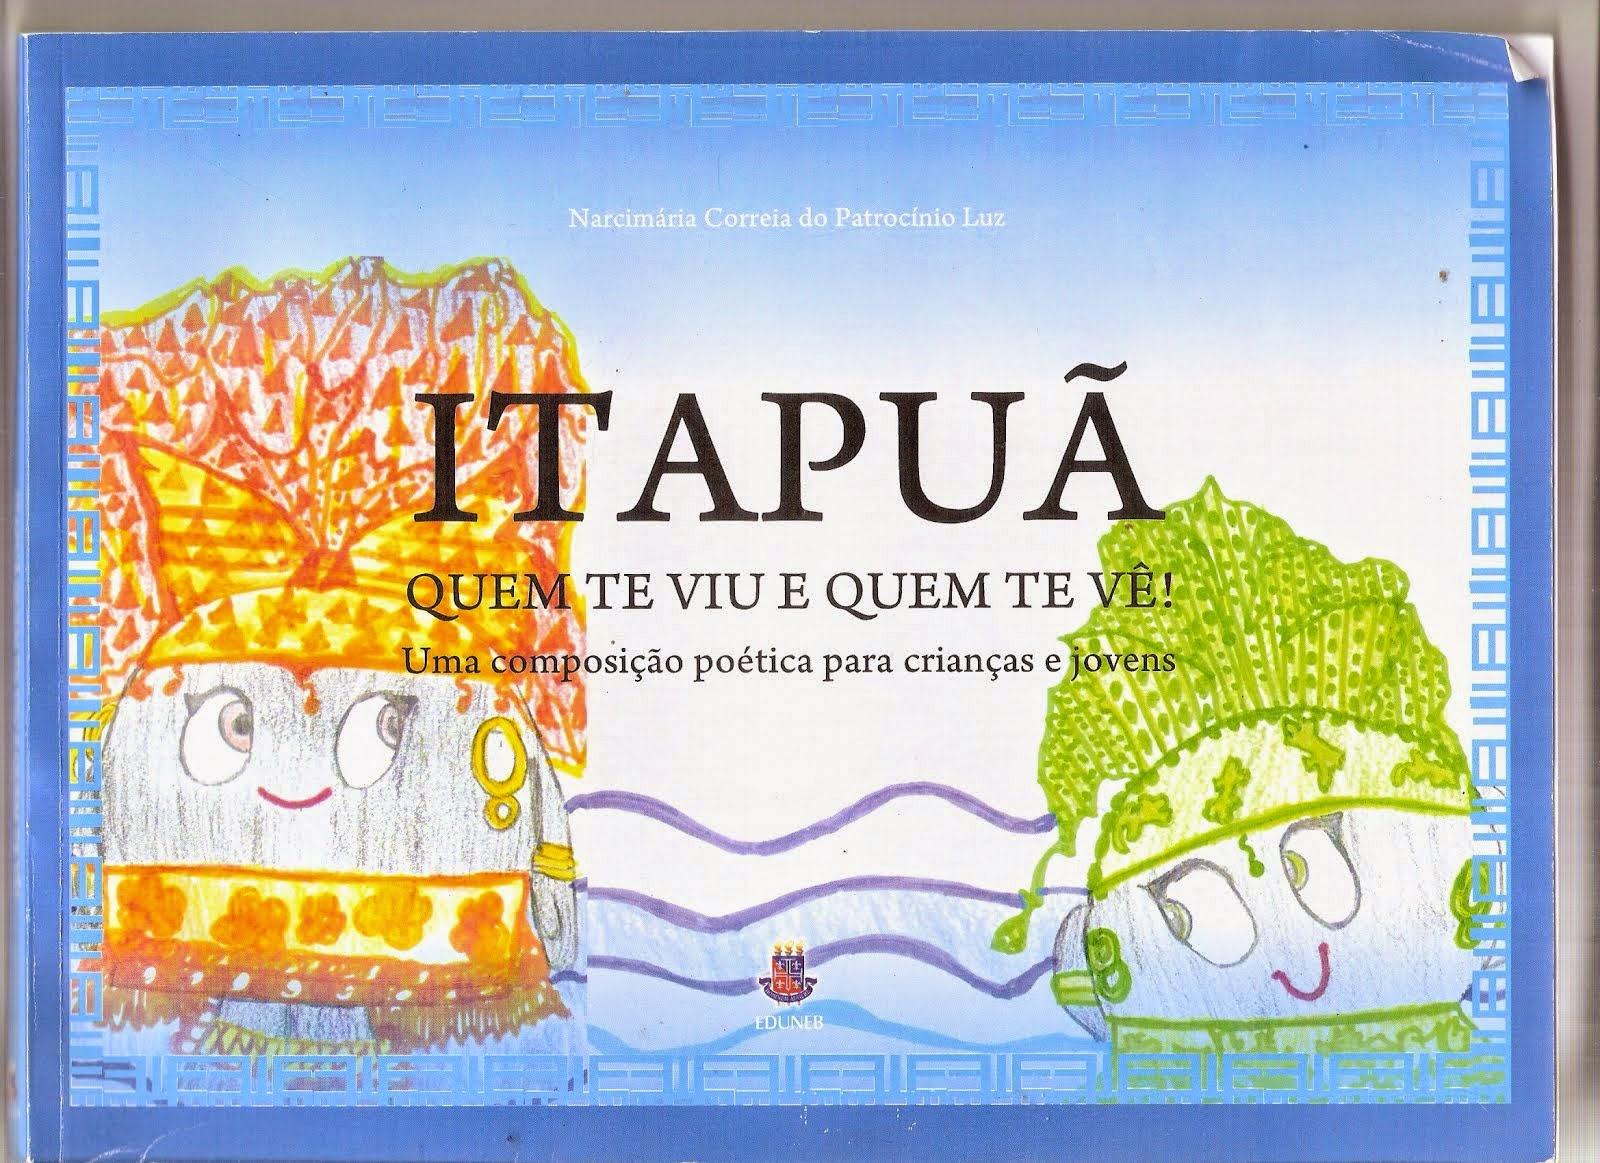 ITAPUÃ. QUEM TE VIU QUEM TE VÊ